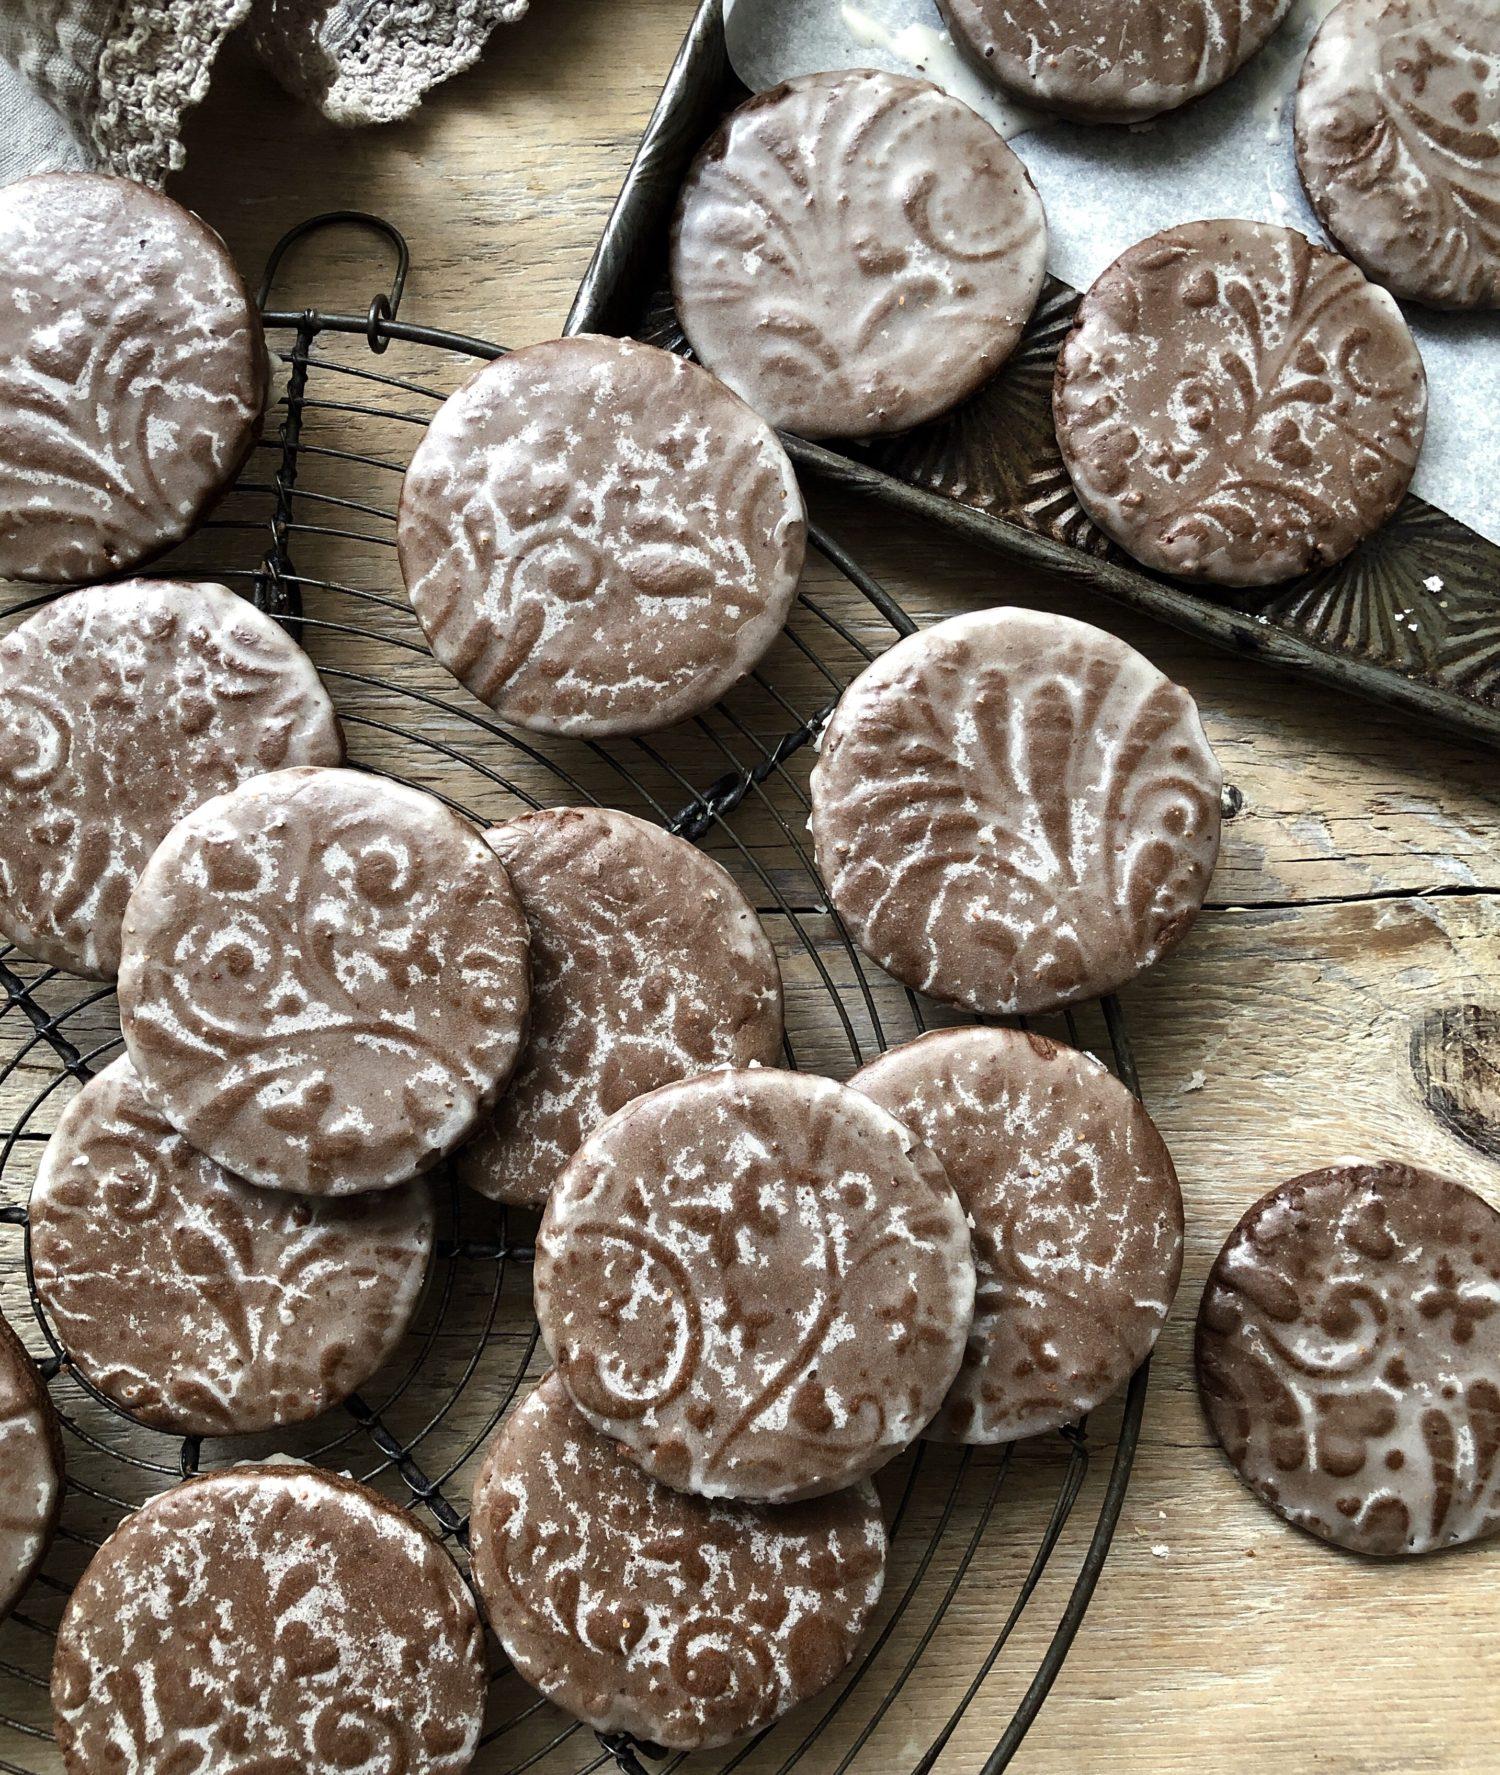 Gingerbread cookies using embossed rolling pin